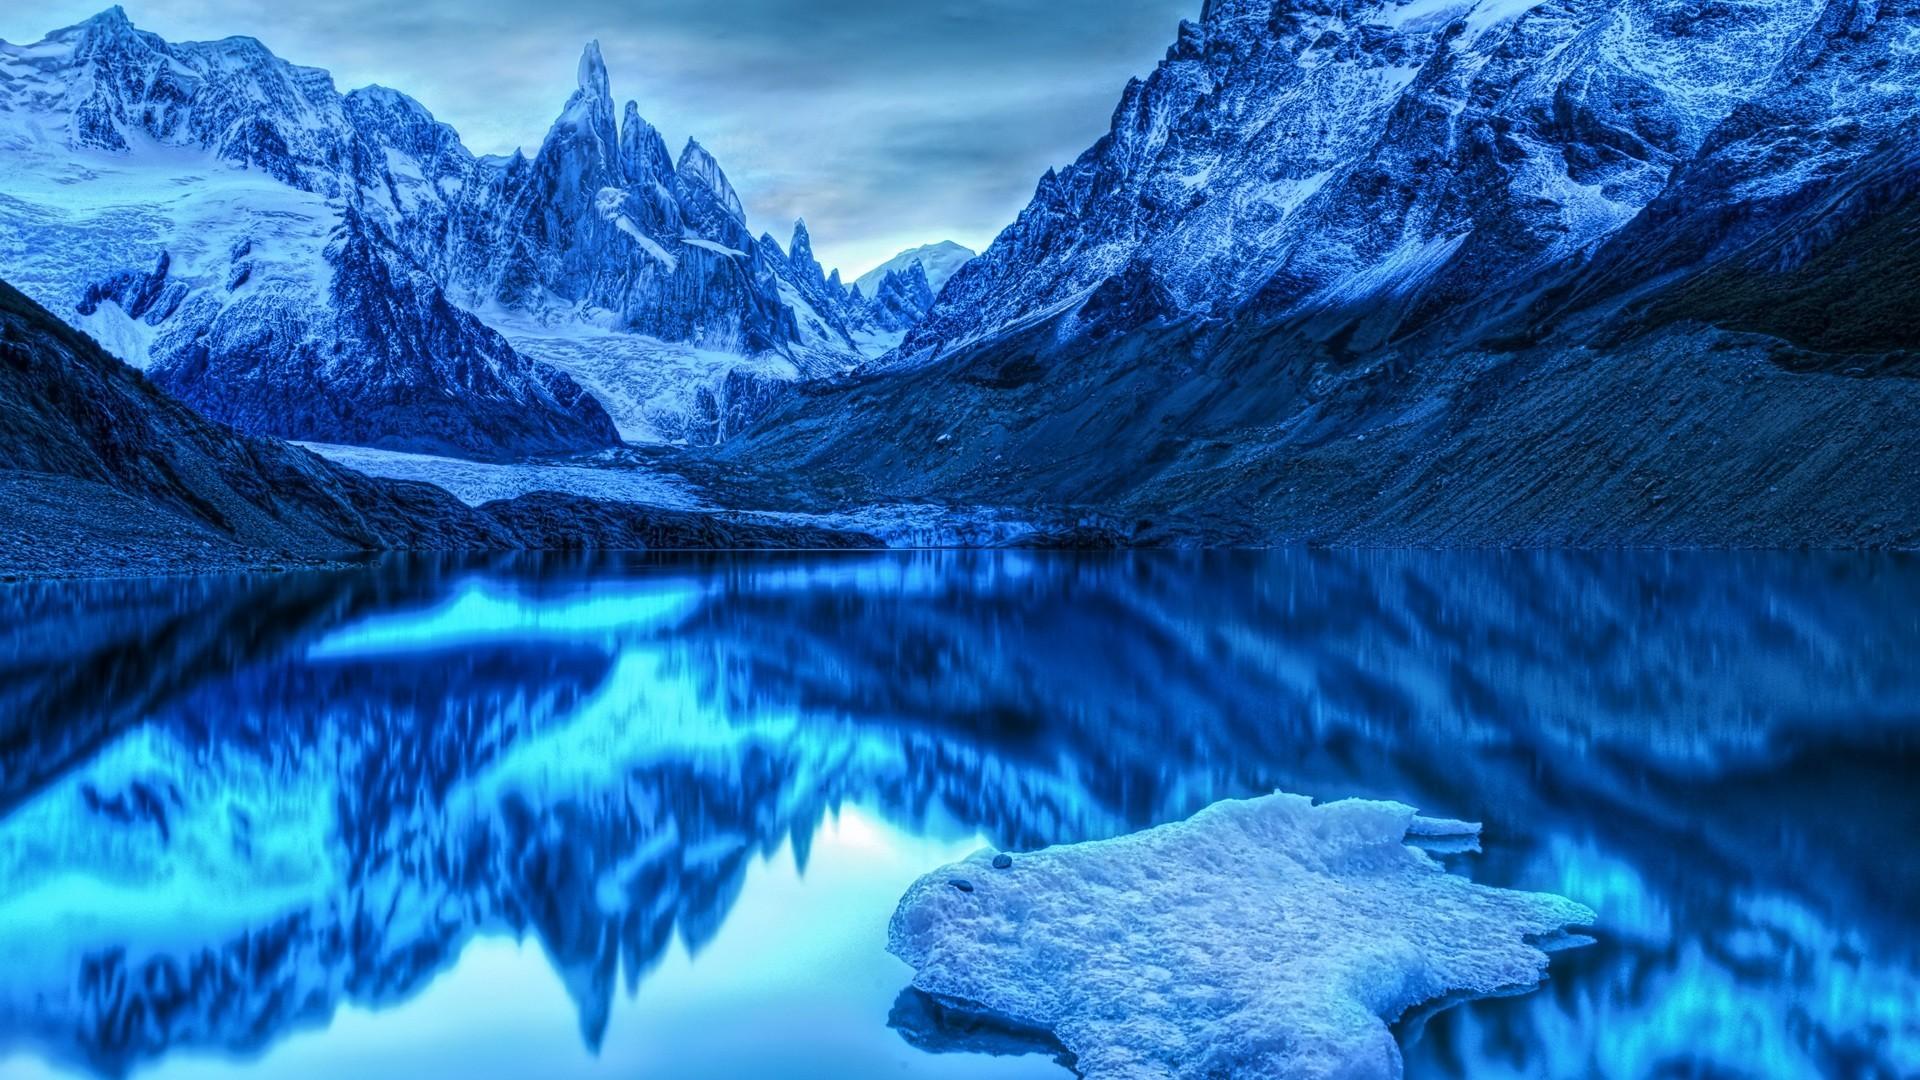 Winter Nature Scenes Wallpapers 69 Wallpapers HD Wallpapers